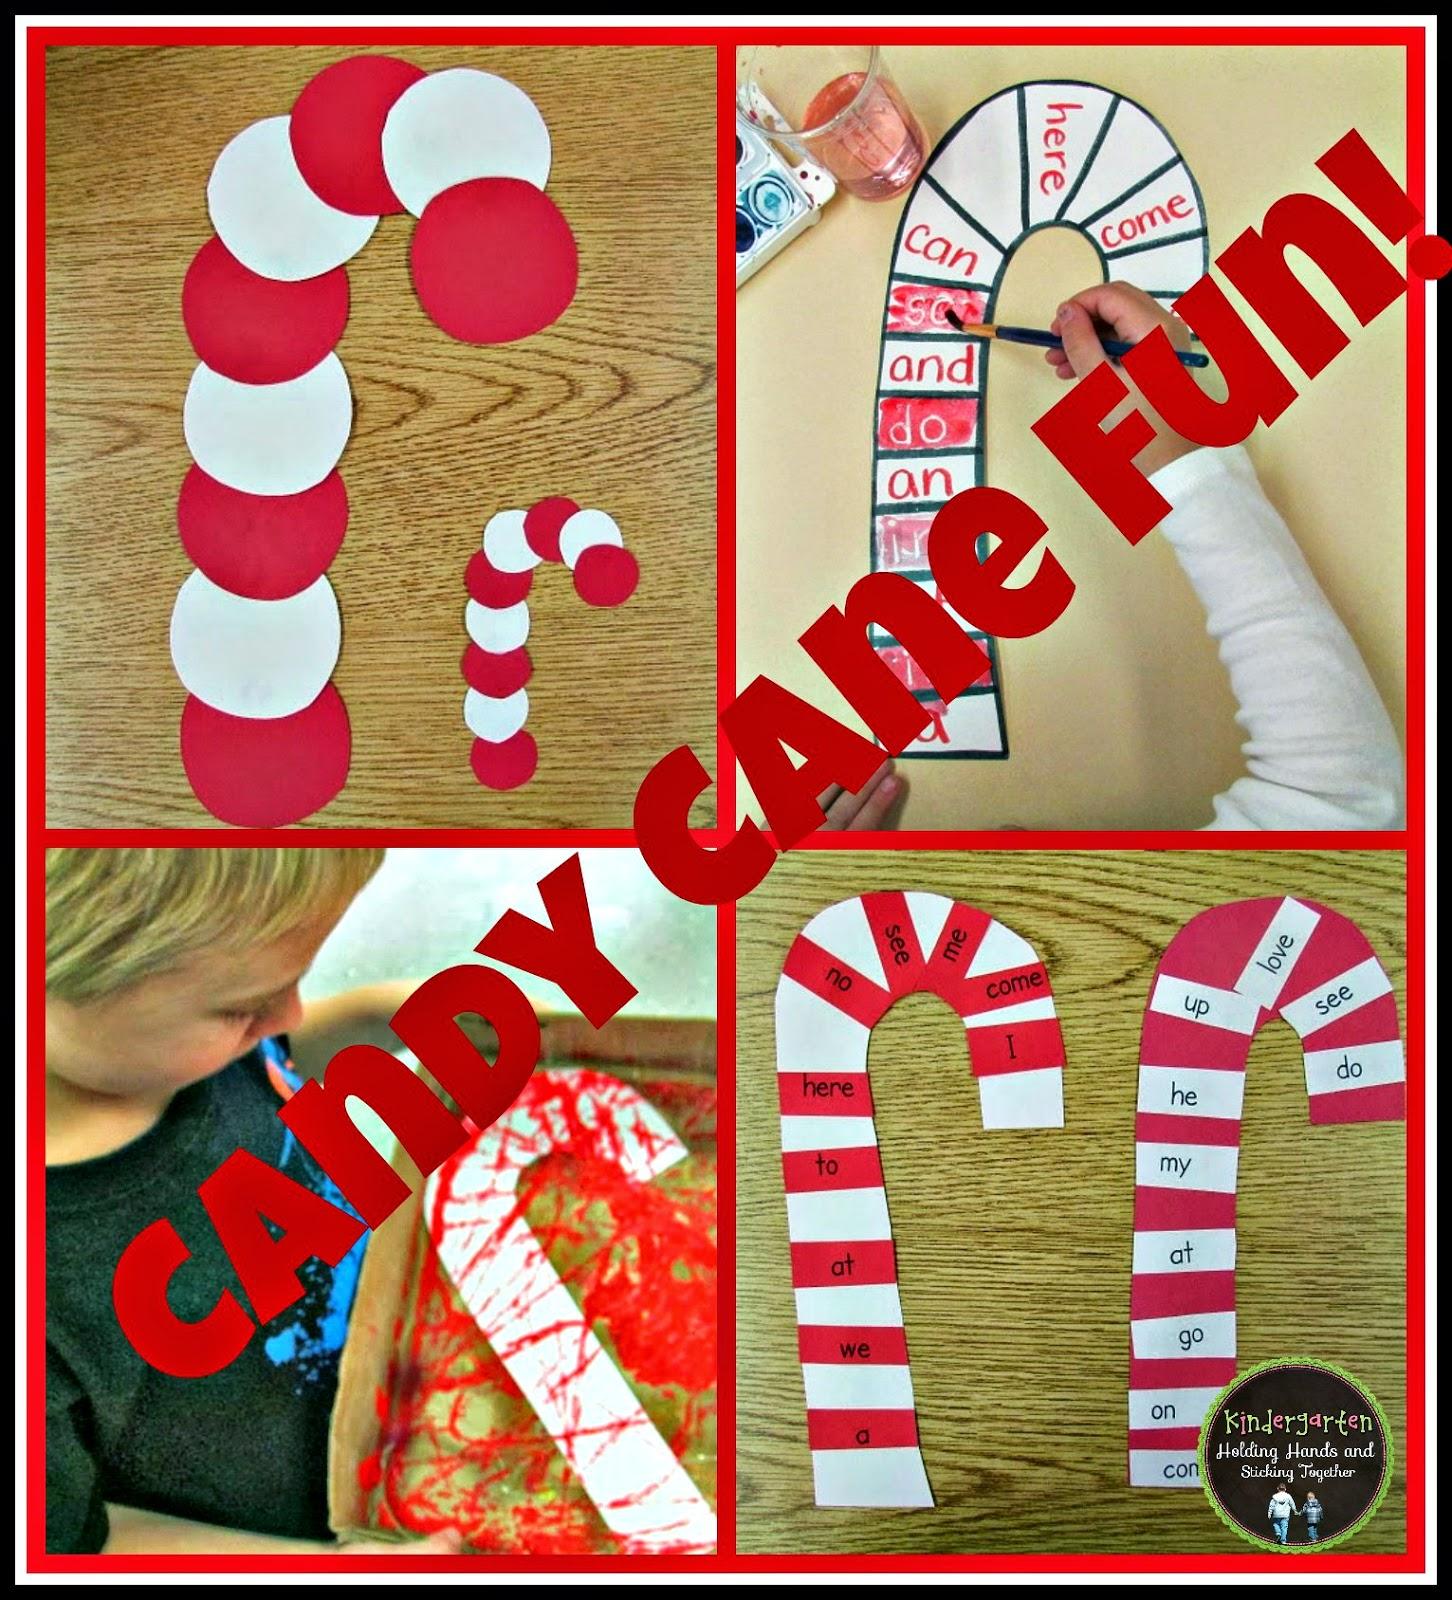 Kindergarten Holding Hands And Sticking Together Candy